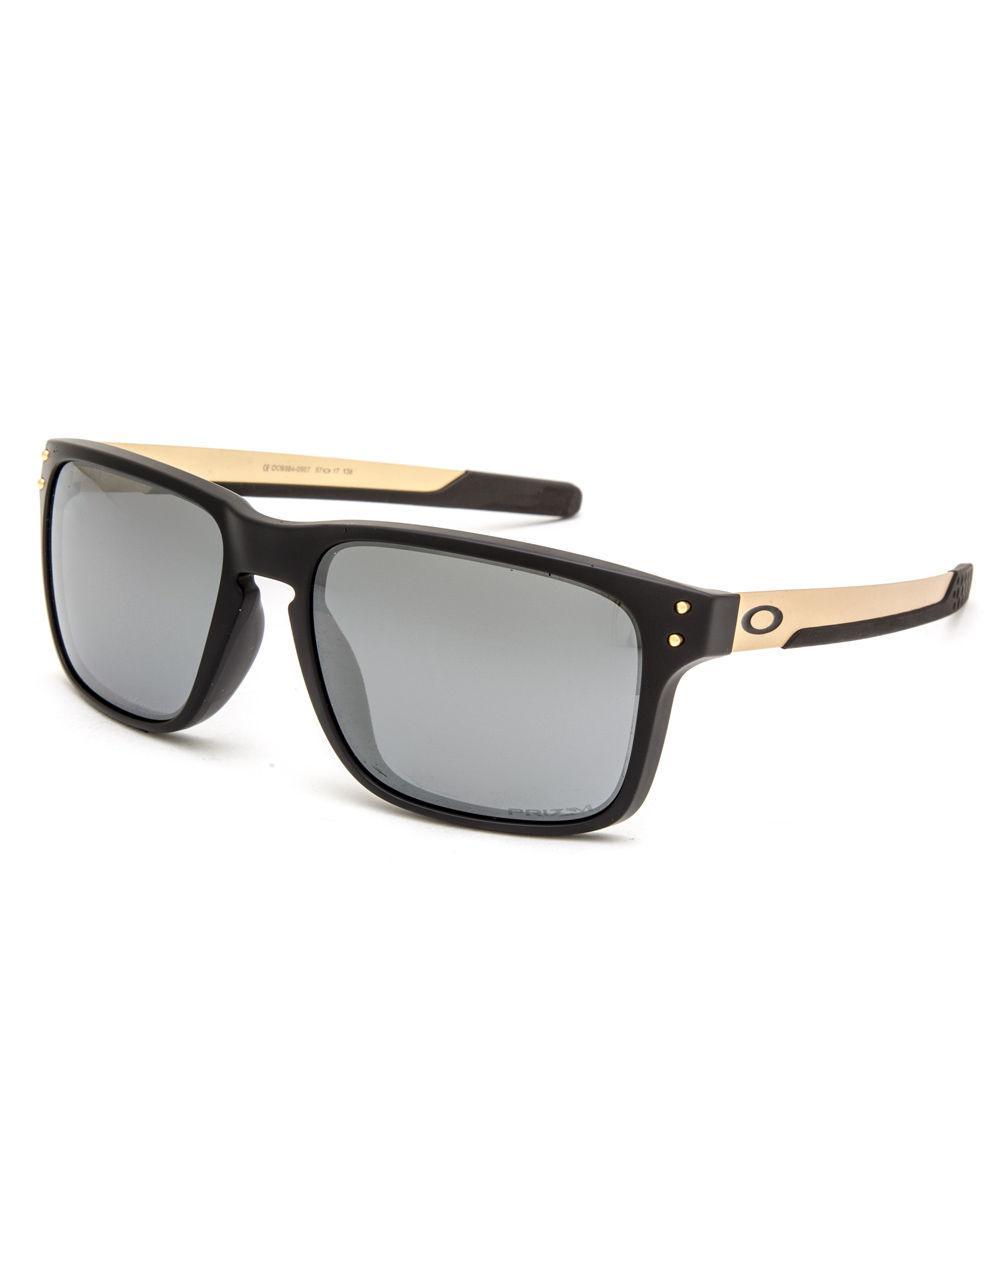 48141fdff4 Oakley. Men s Holbrook Mix Matte Black   Prizm Black Polarized Sunglasses